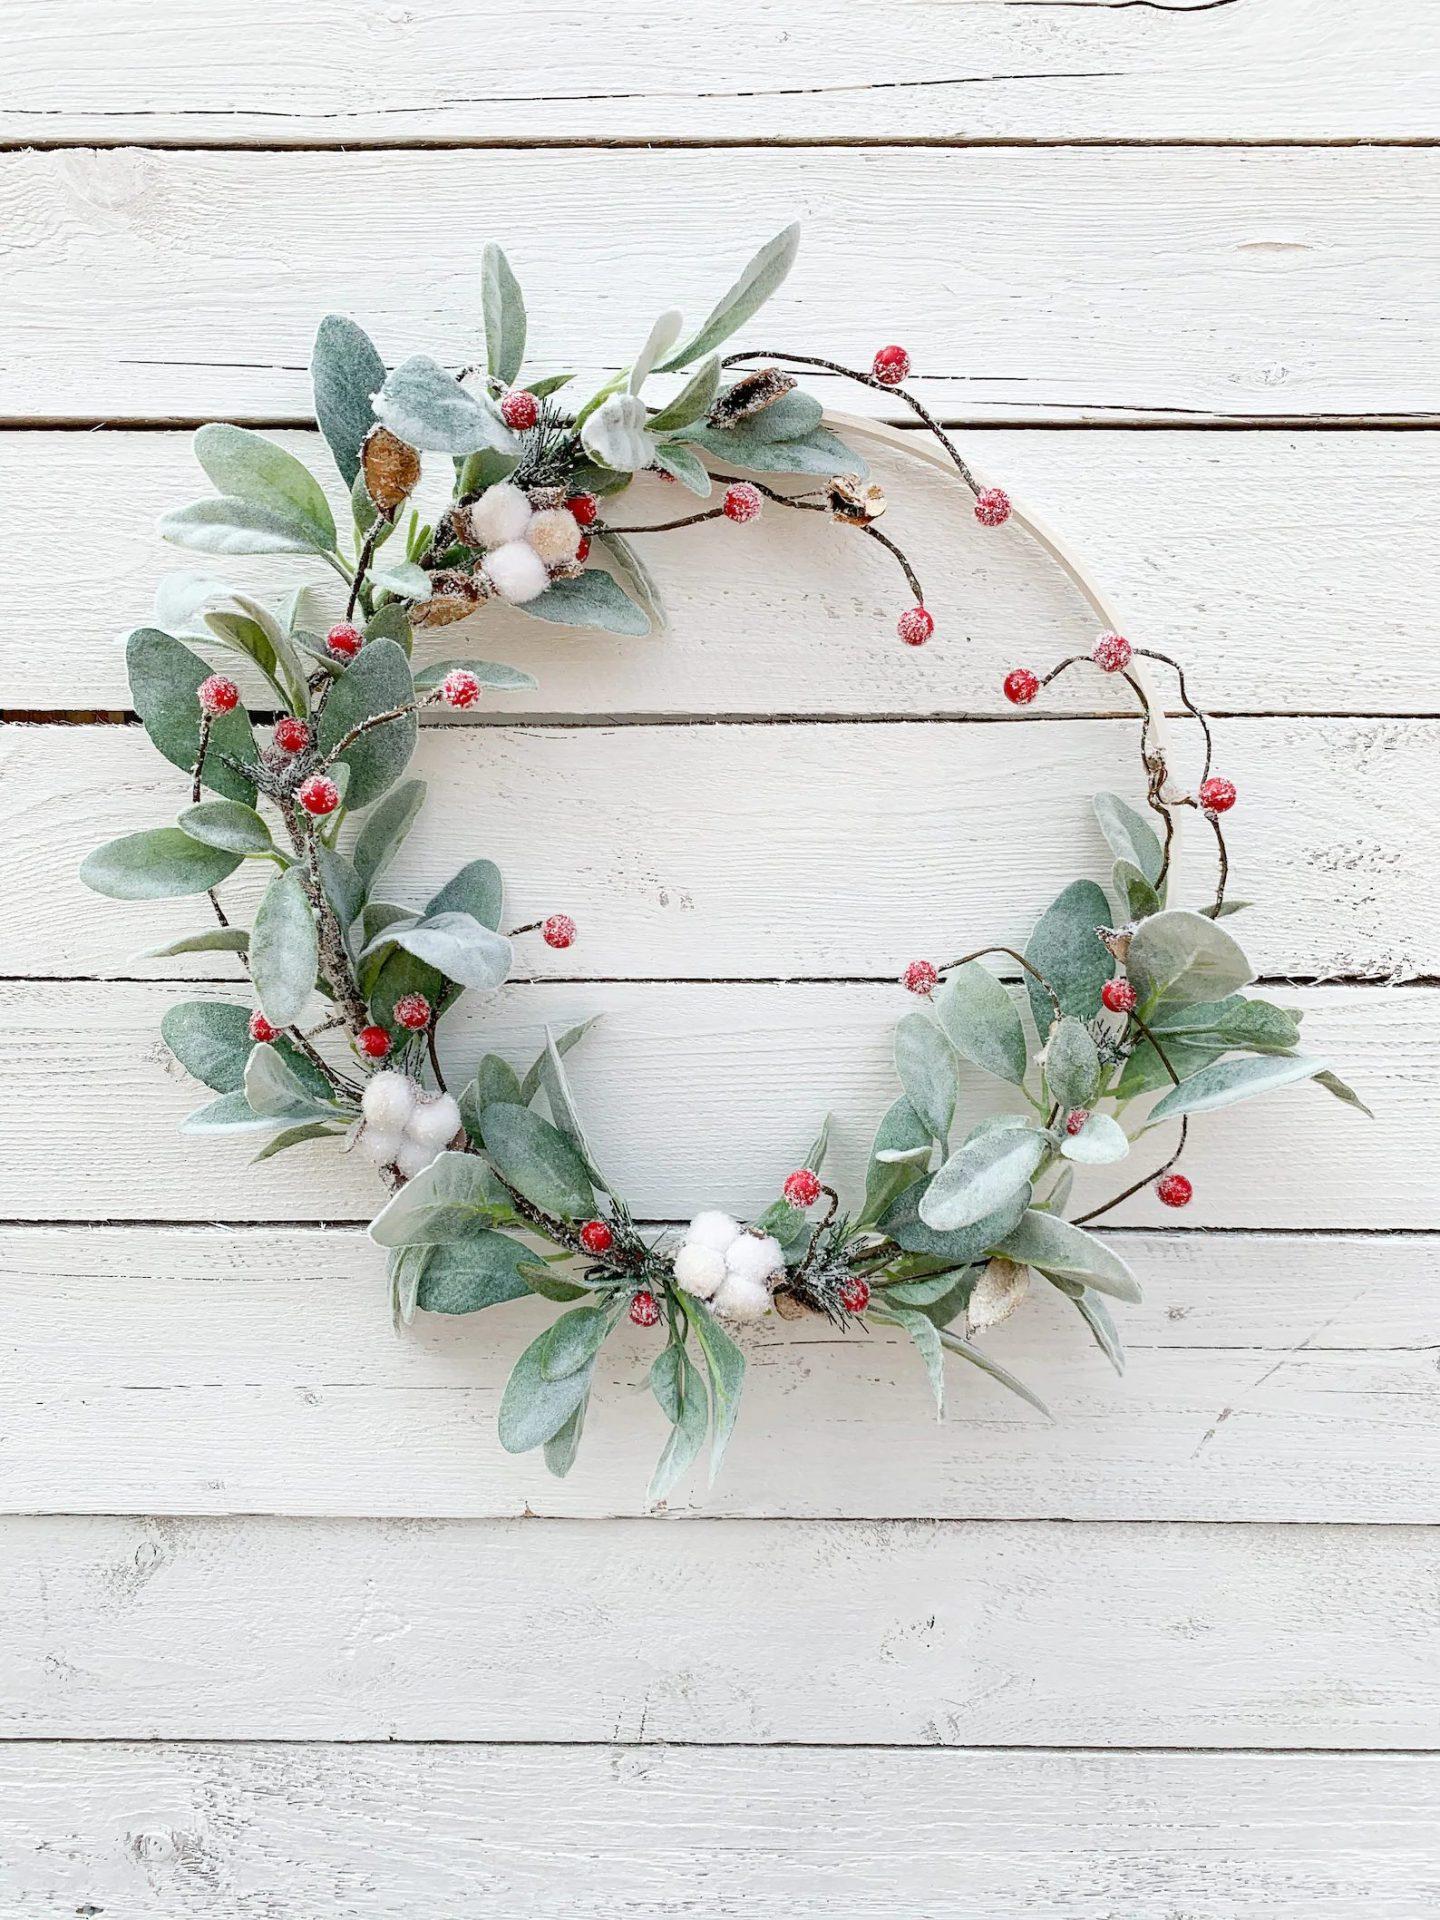 Minimalist Christmas hoop wreath with berries and lambs ear